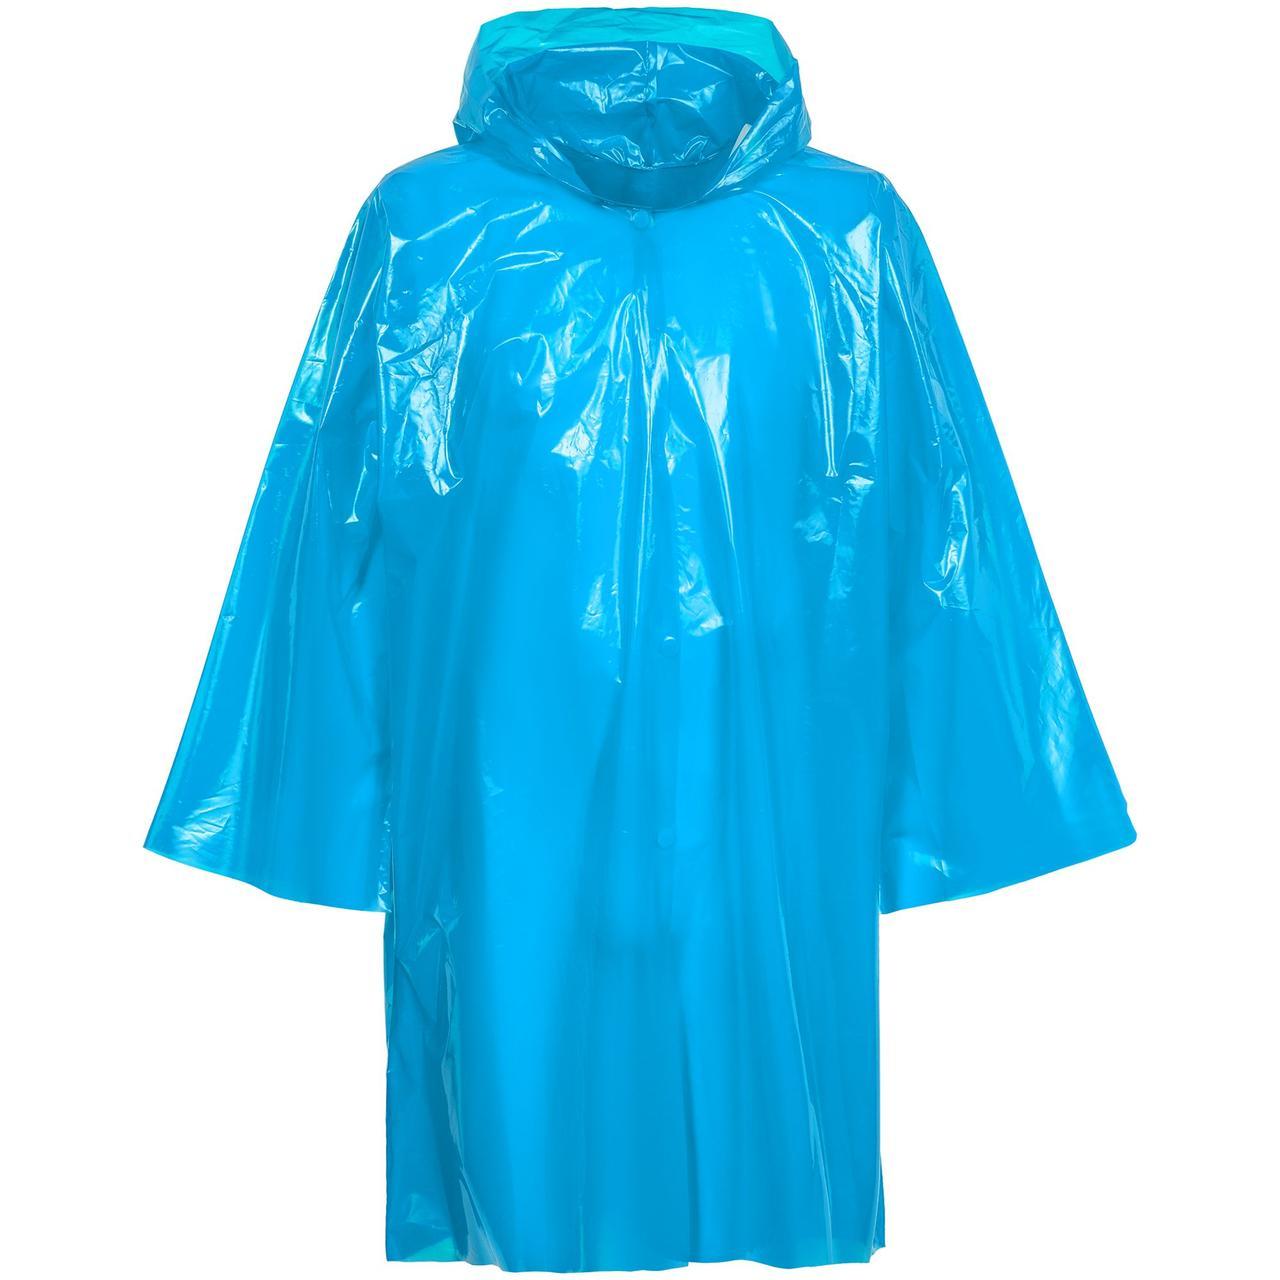 Дождевик-плащ CloudTime, голубой (артикул 11876.41)